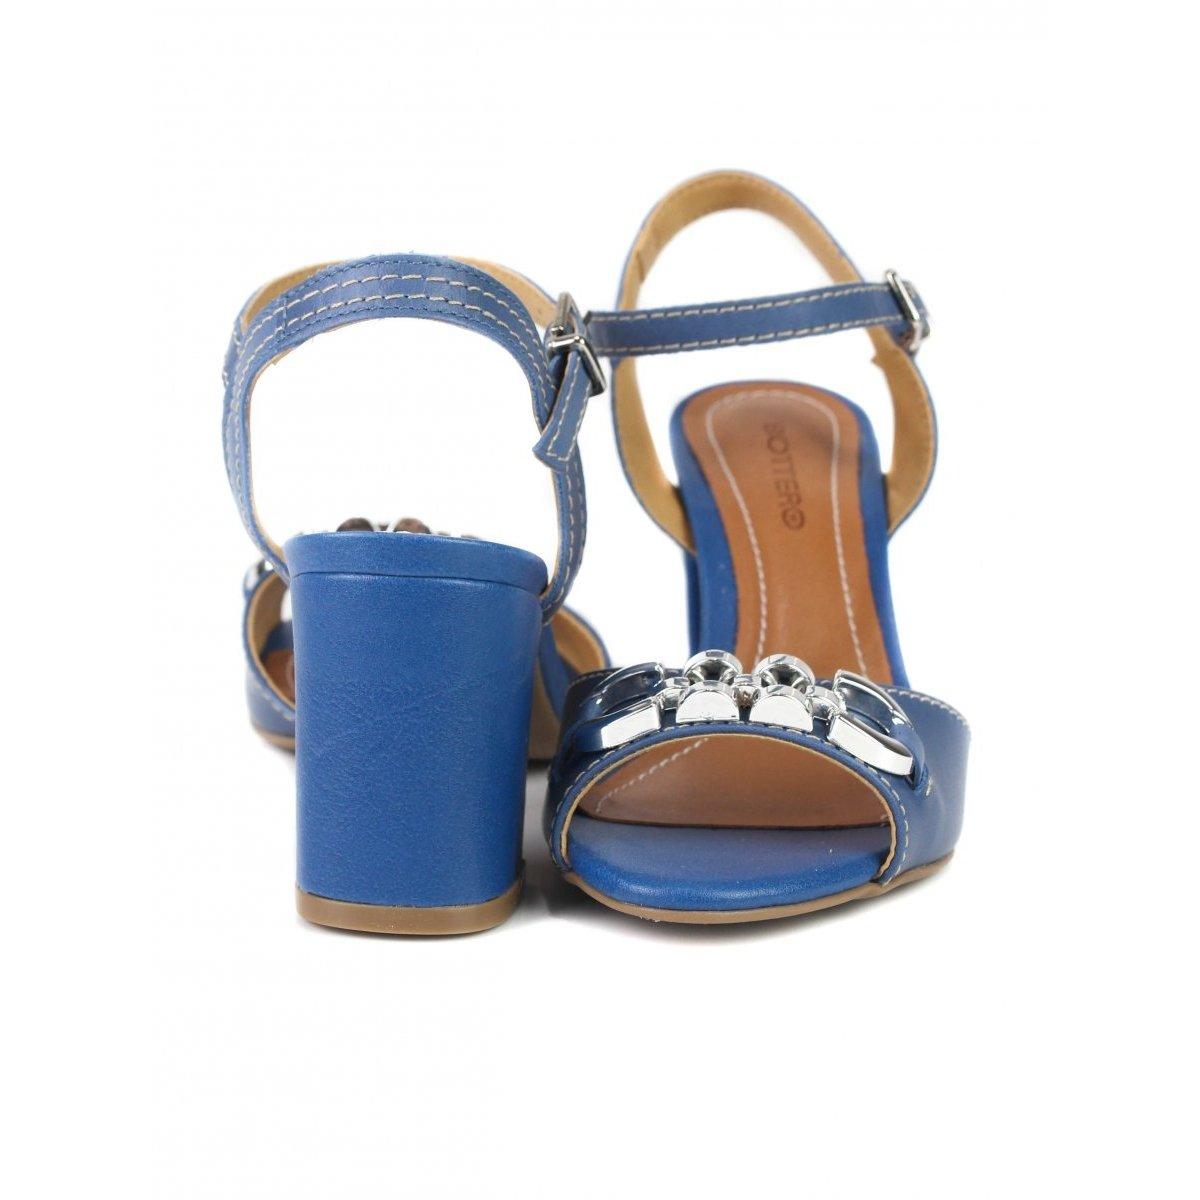 Bottero Firenzi Firenzi Bottero Bottero Sandália Feminina Firenzi Sandália Azul Sandália Azul Feminina 1w6x8